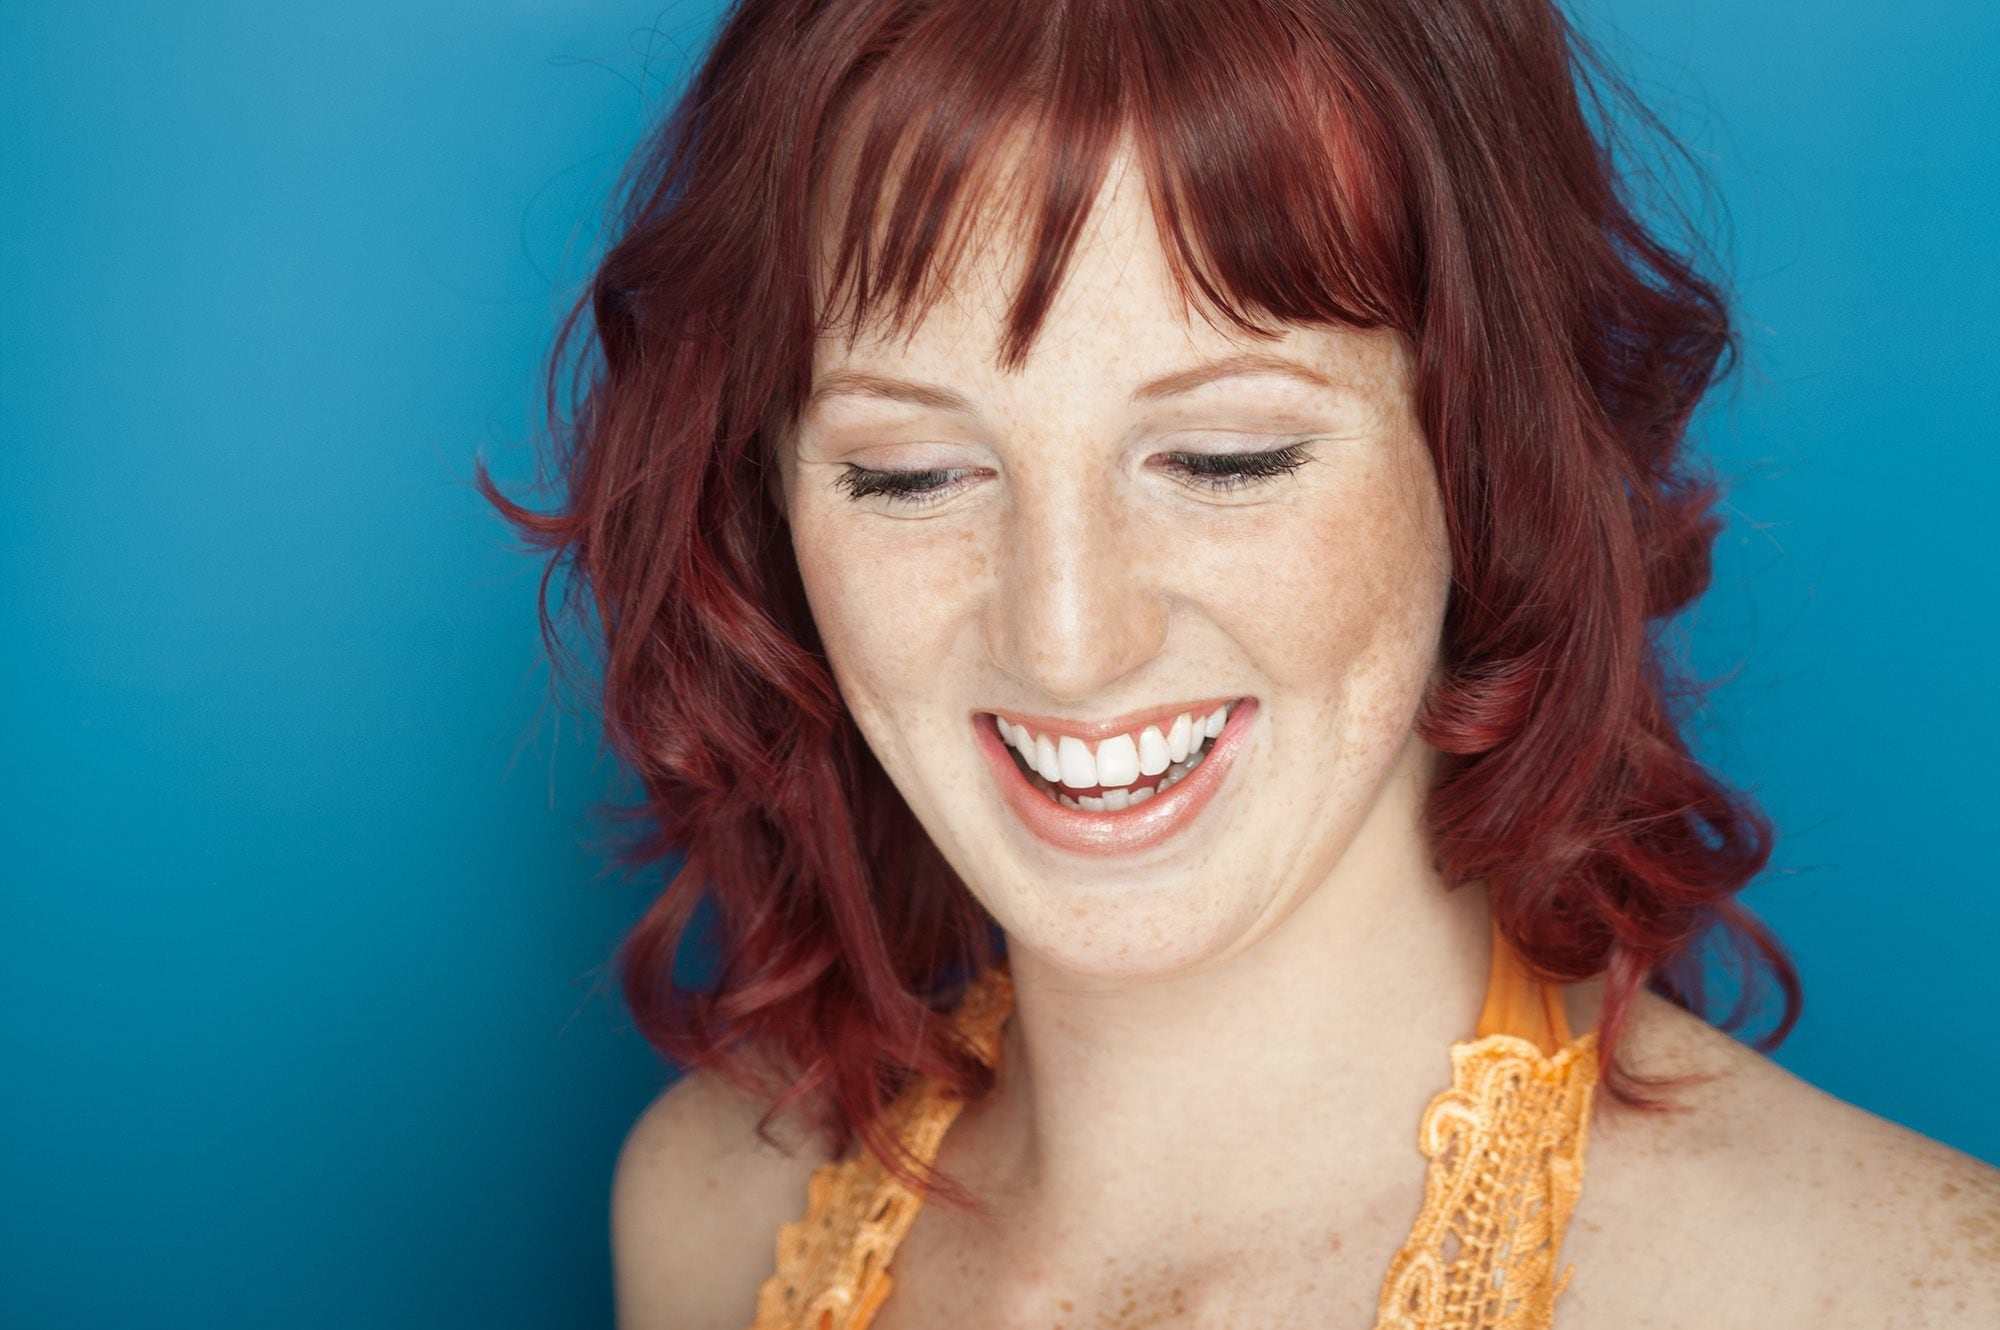 Warna rambut cokelat kemerahan dengan balayage warna merah.